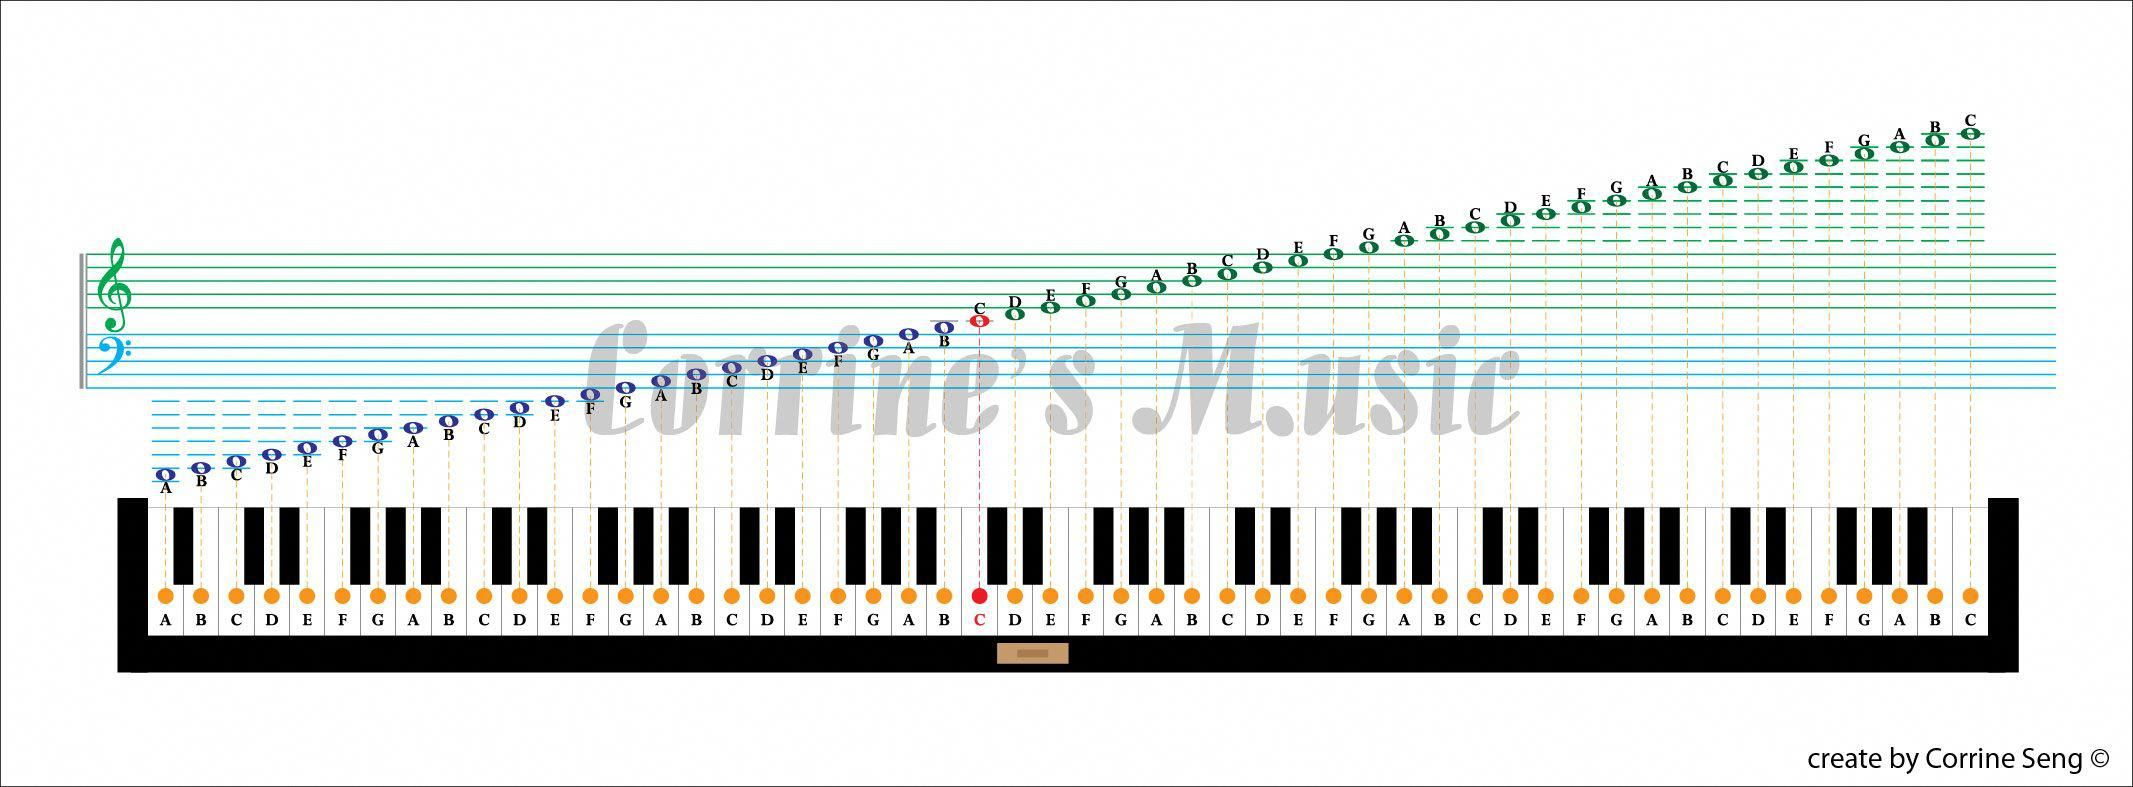 Complete 88 Keys Piano Notes Chart Learnpianokeys Piano Lessons